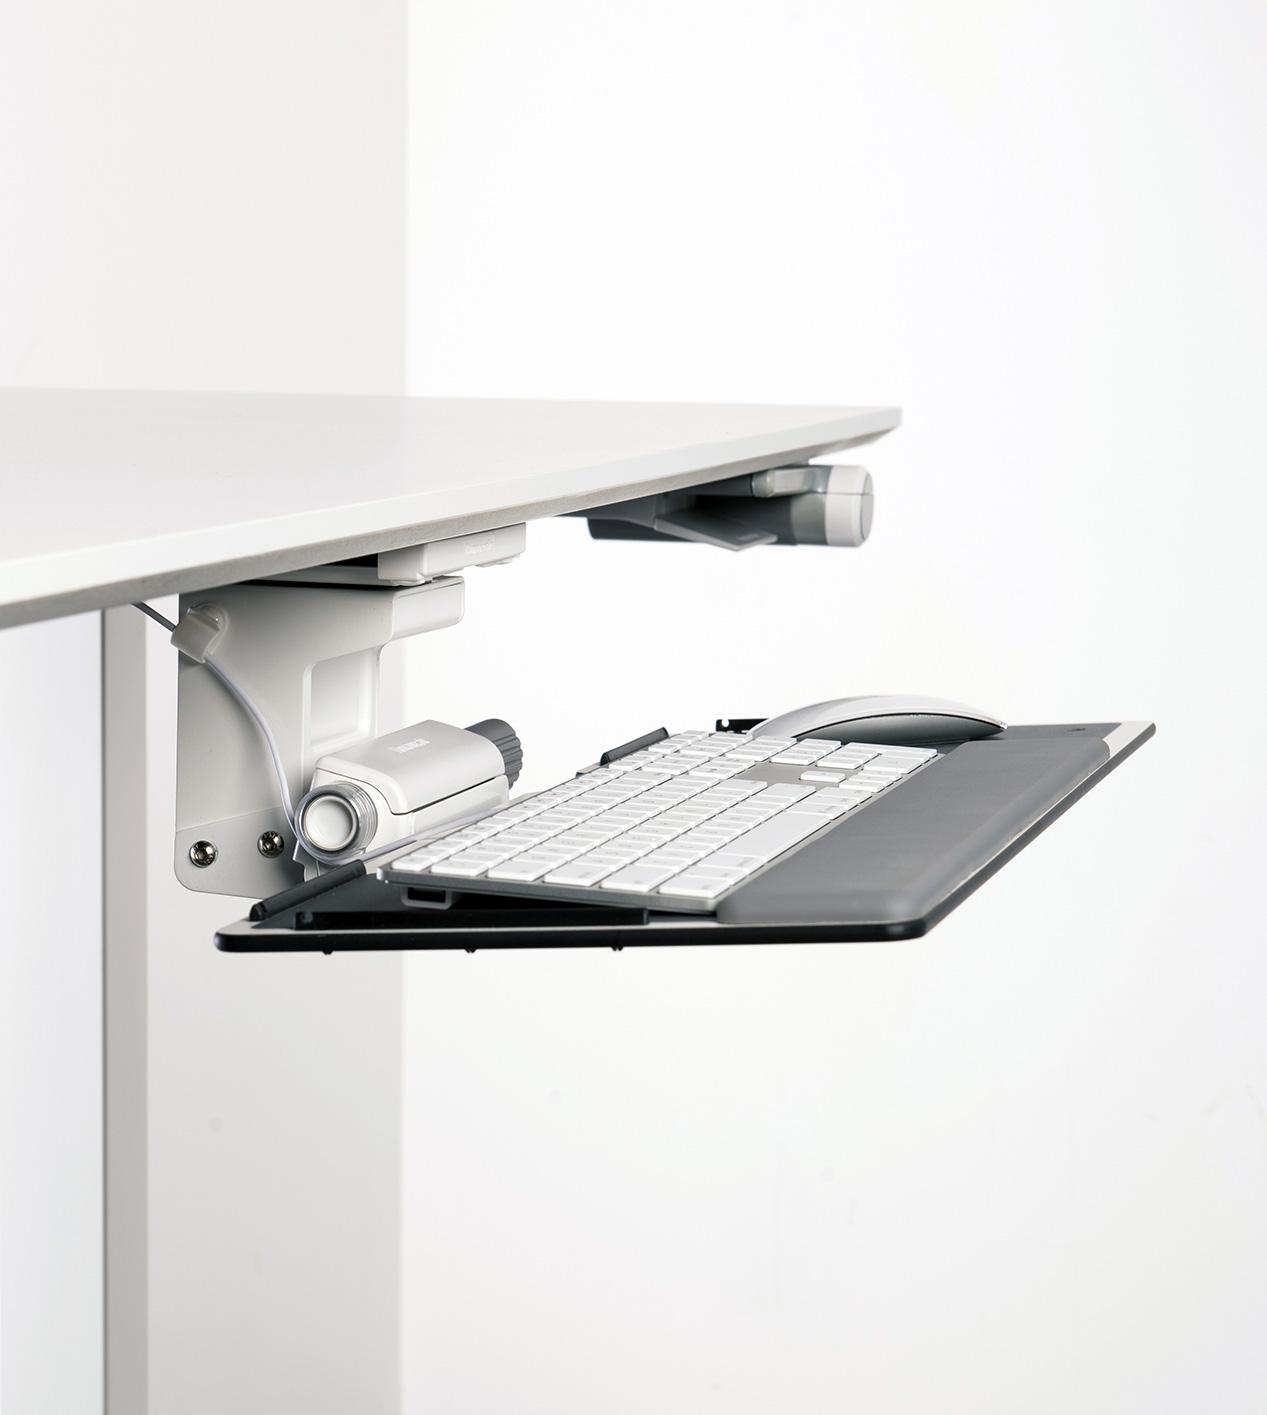 25231e-humanscale-keyboard-home-design-float-tray-10i.jpg